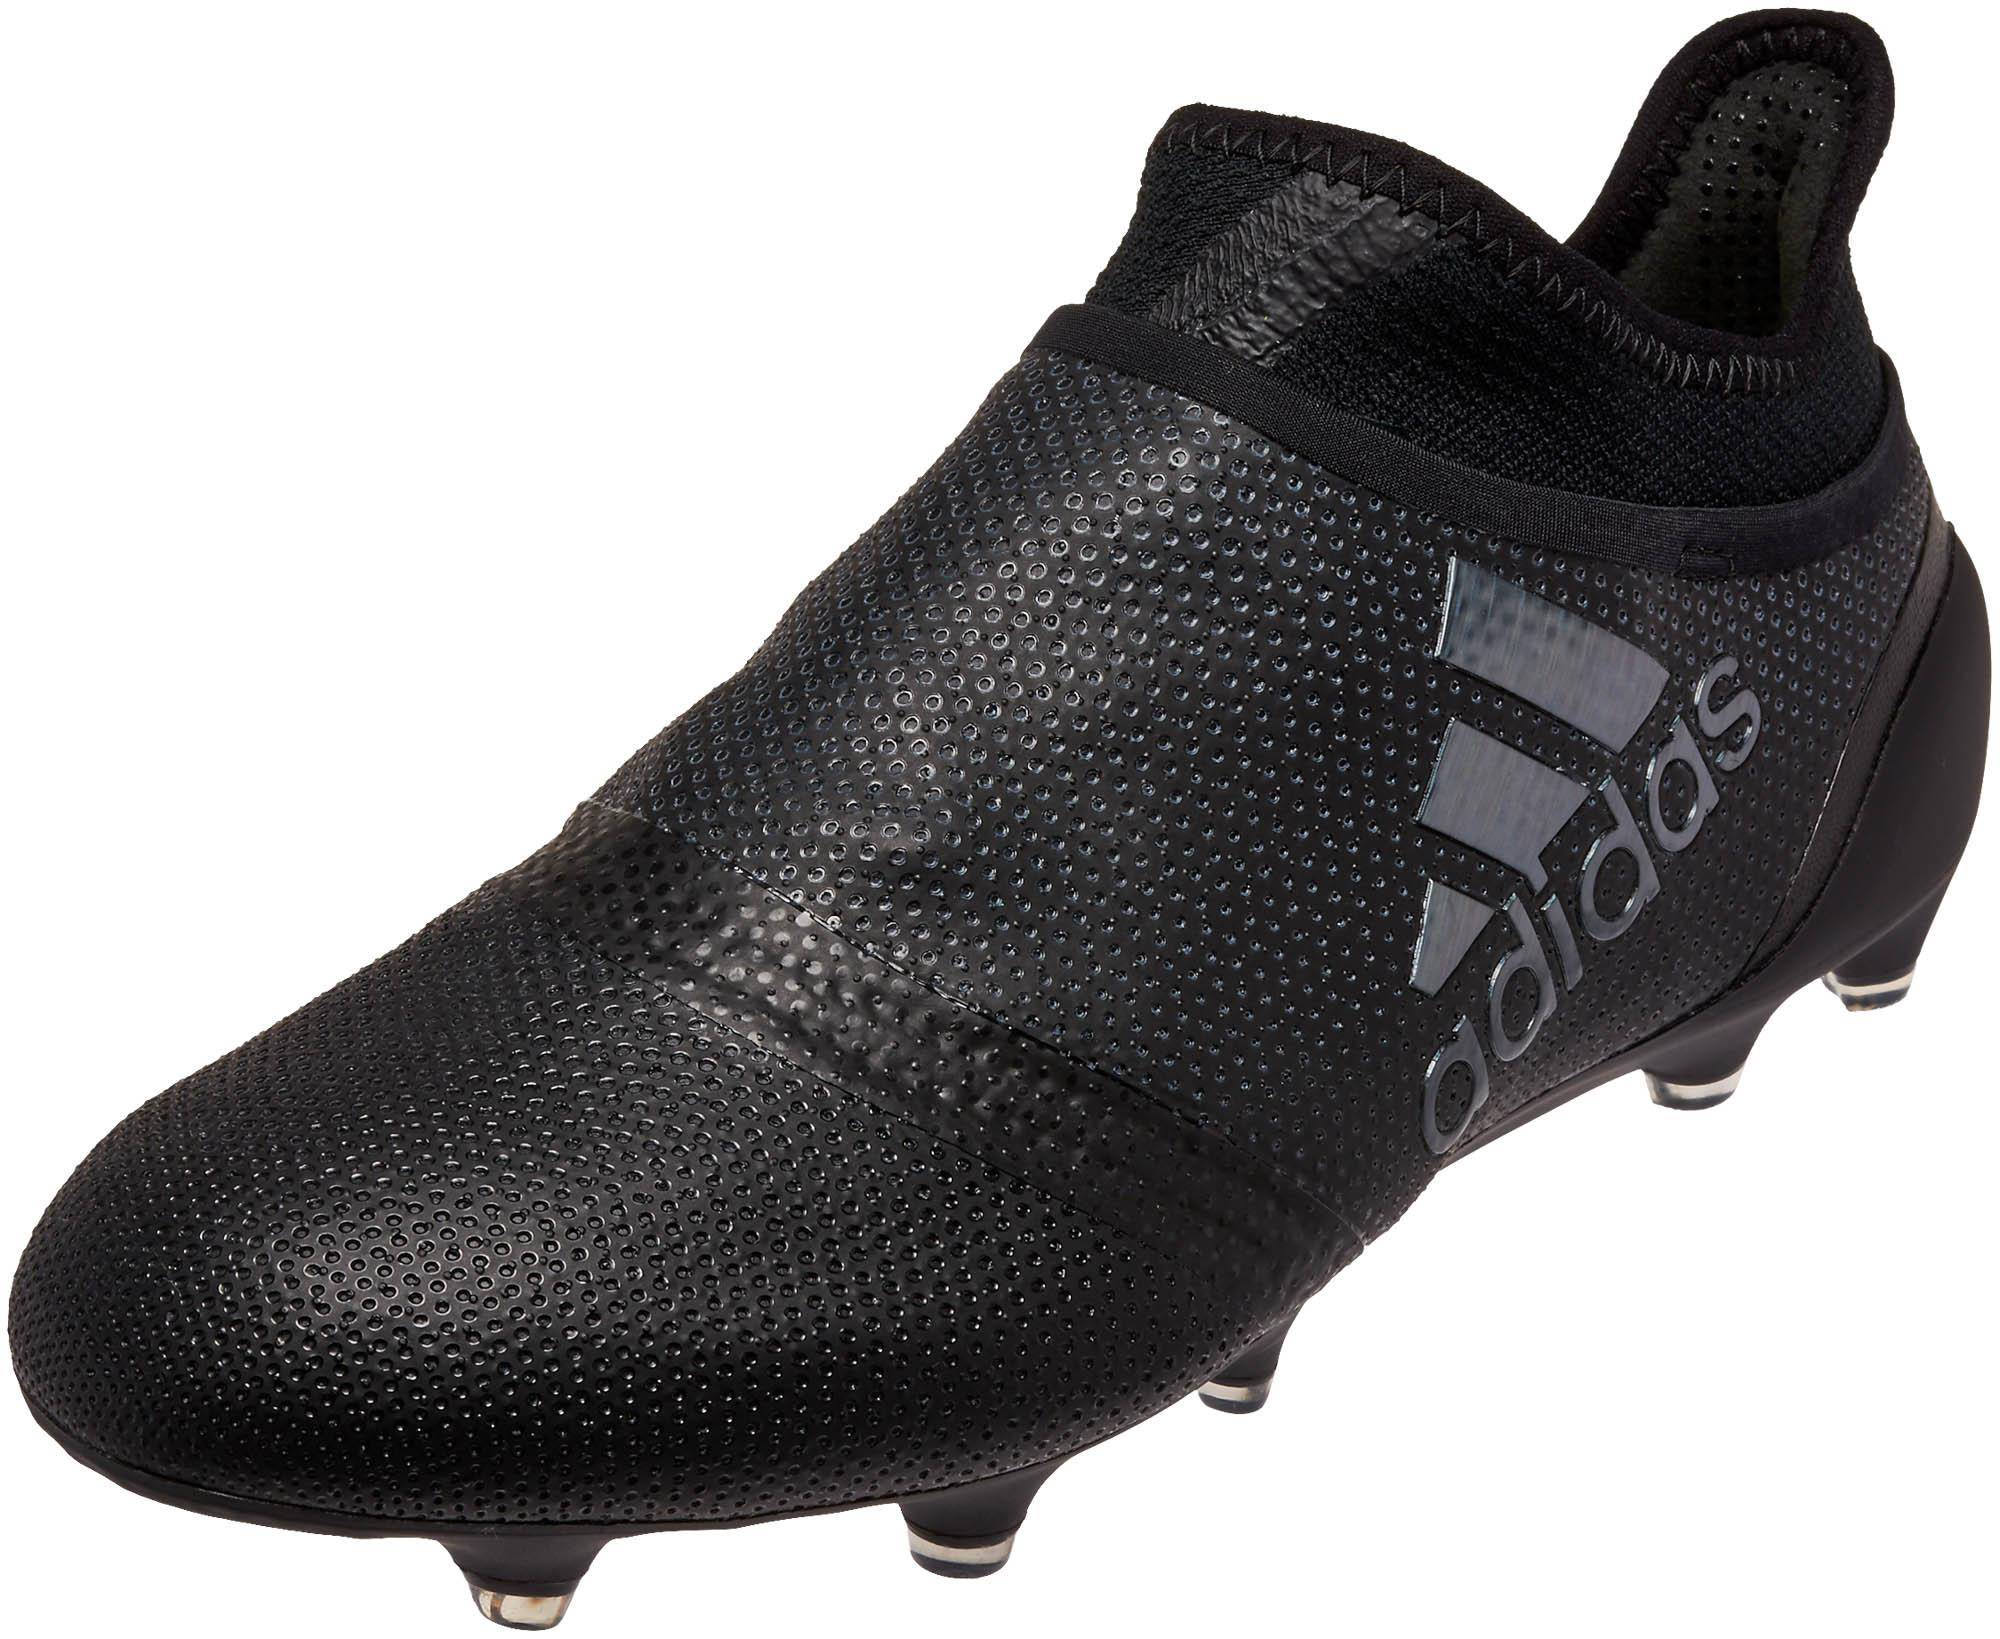 adidas X 17+ Purechaos FG Soccer Cleats - Black - Soccer Master f9b25e79ea32a